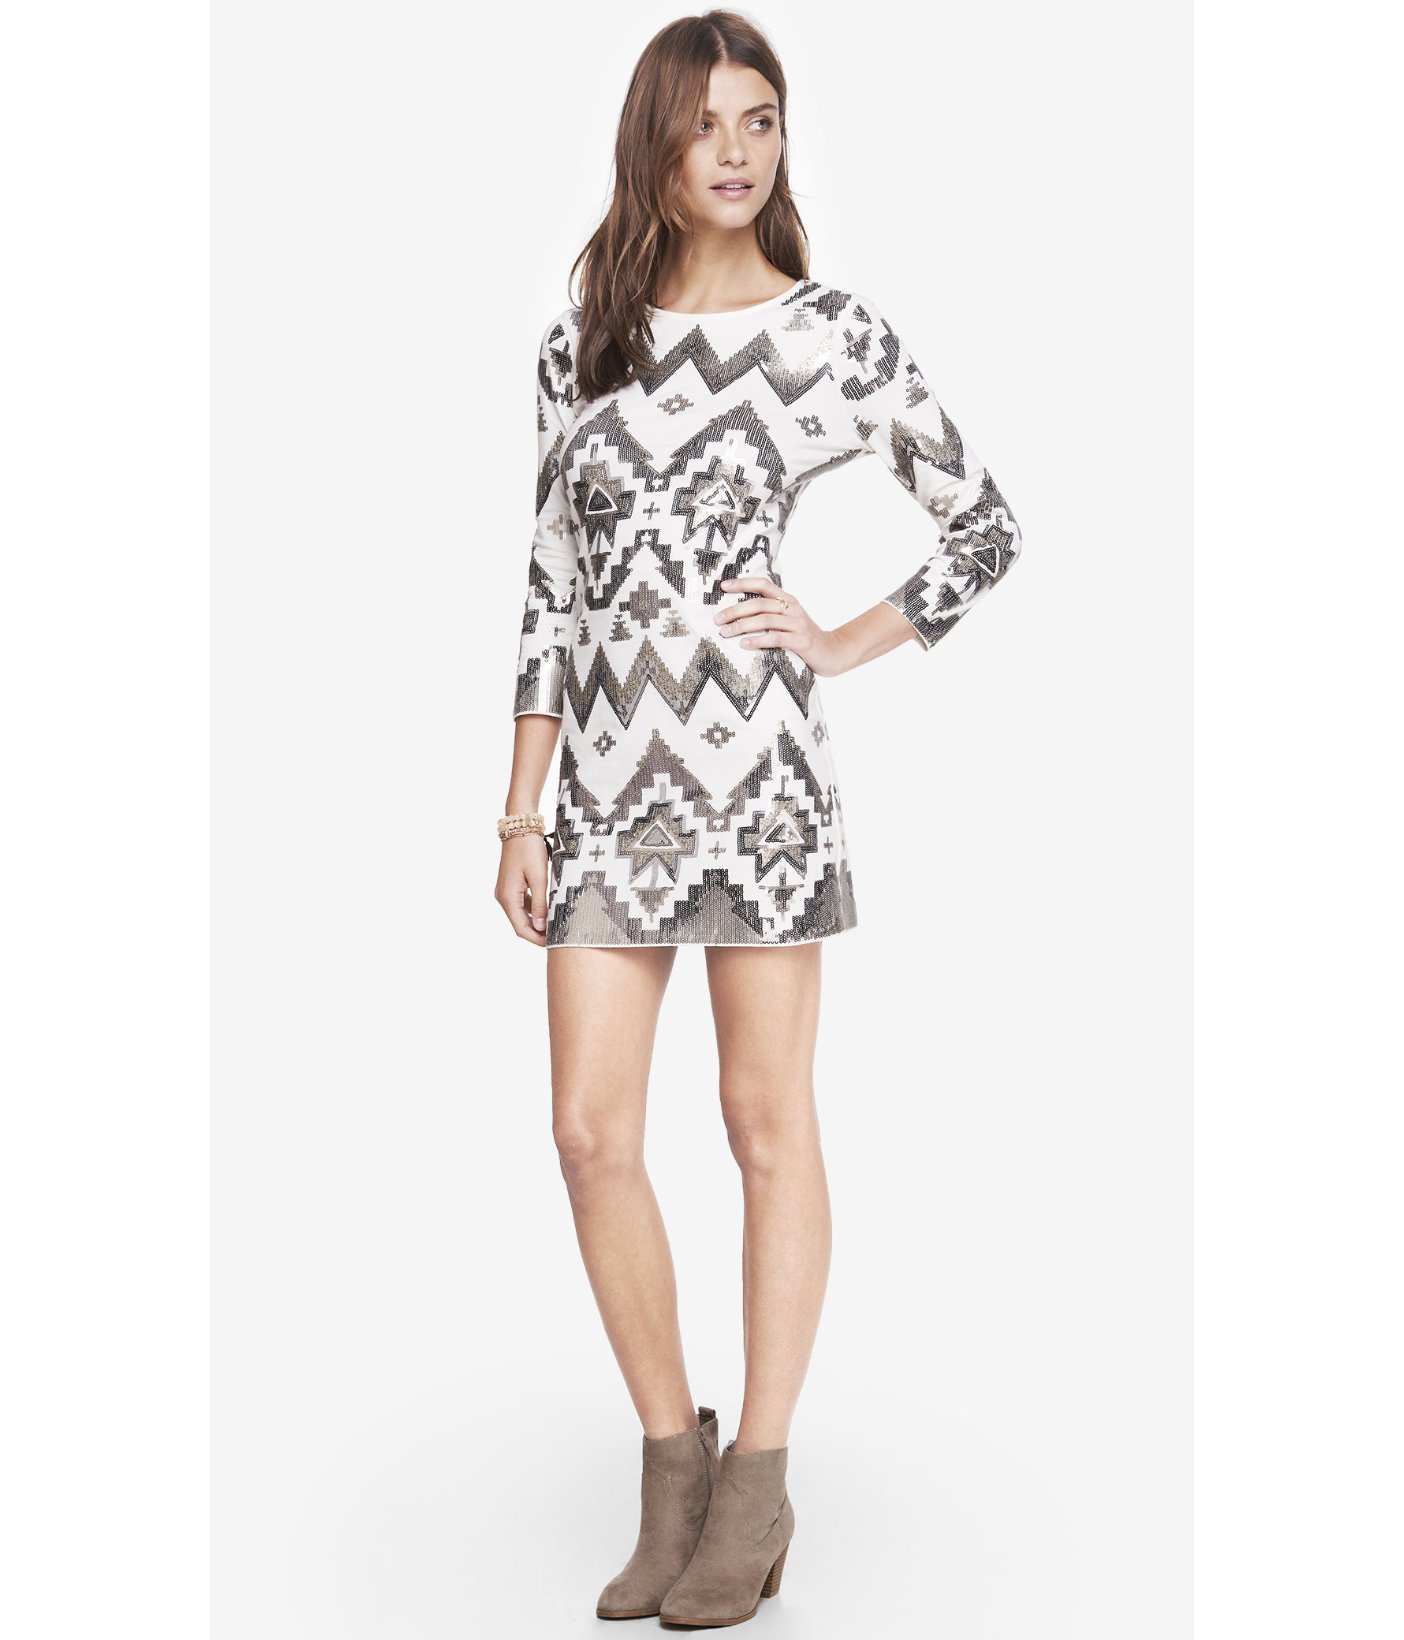 b19ec71c6f6f Lyst - Express Aztec Sequin Embellished Mini Dress in White